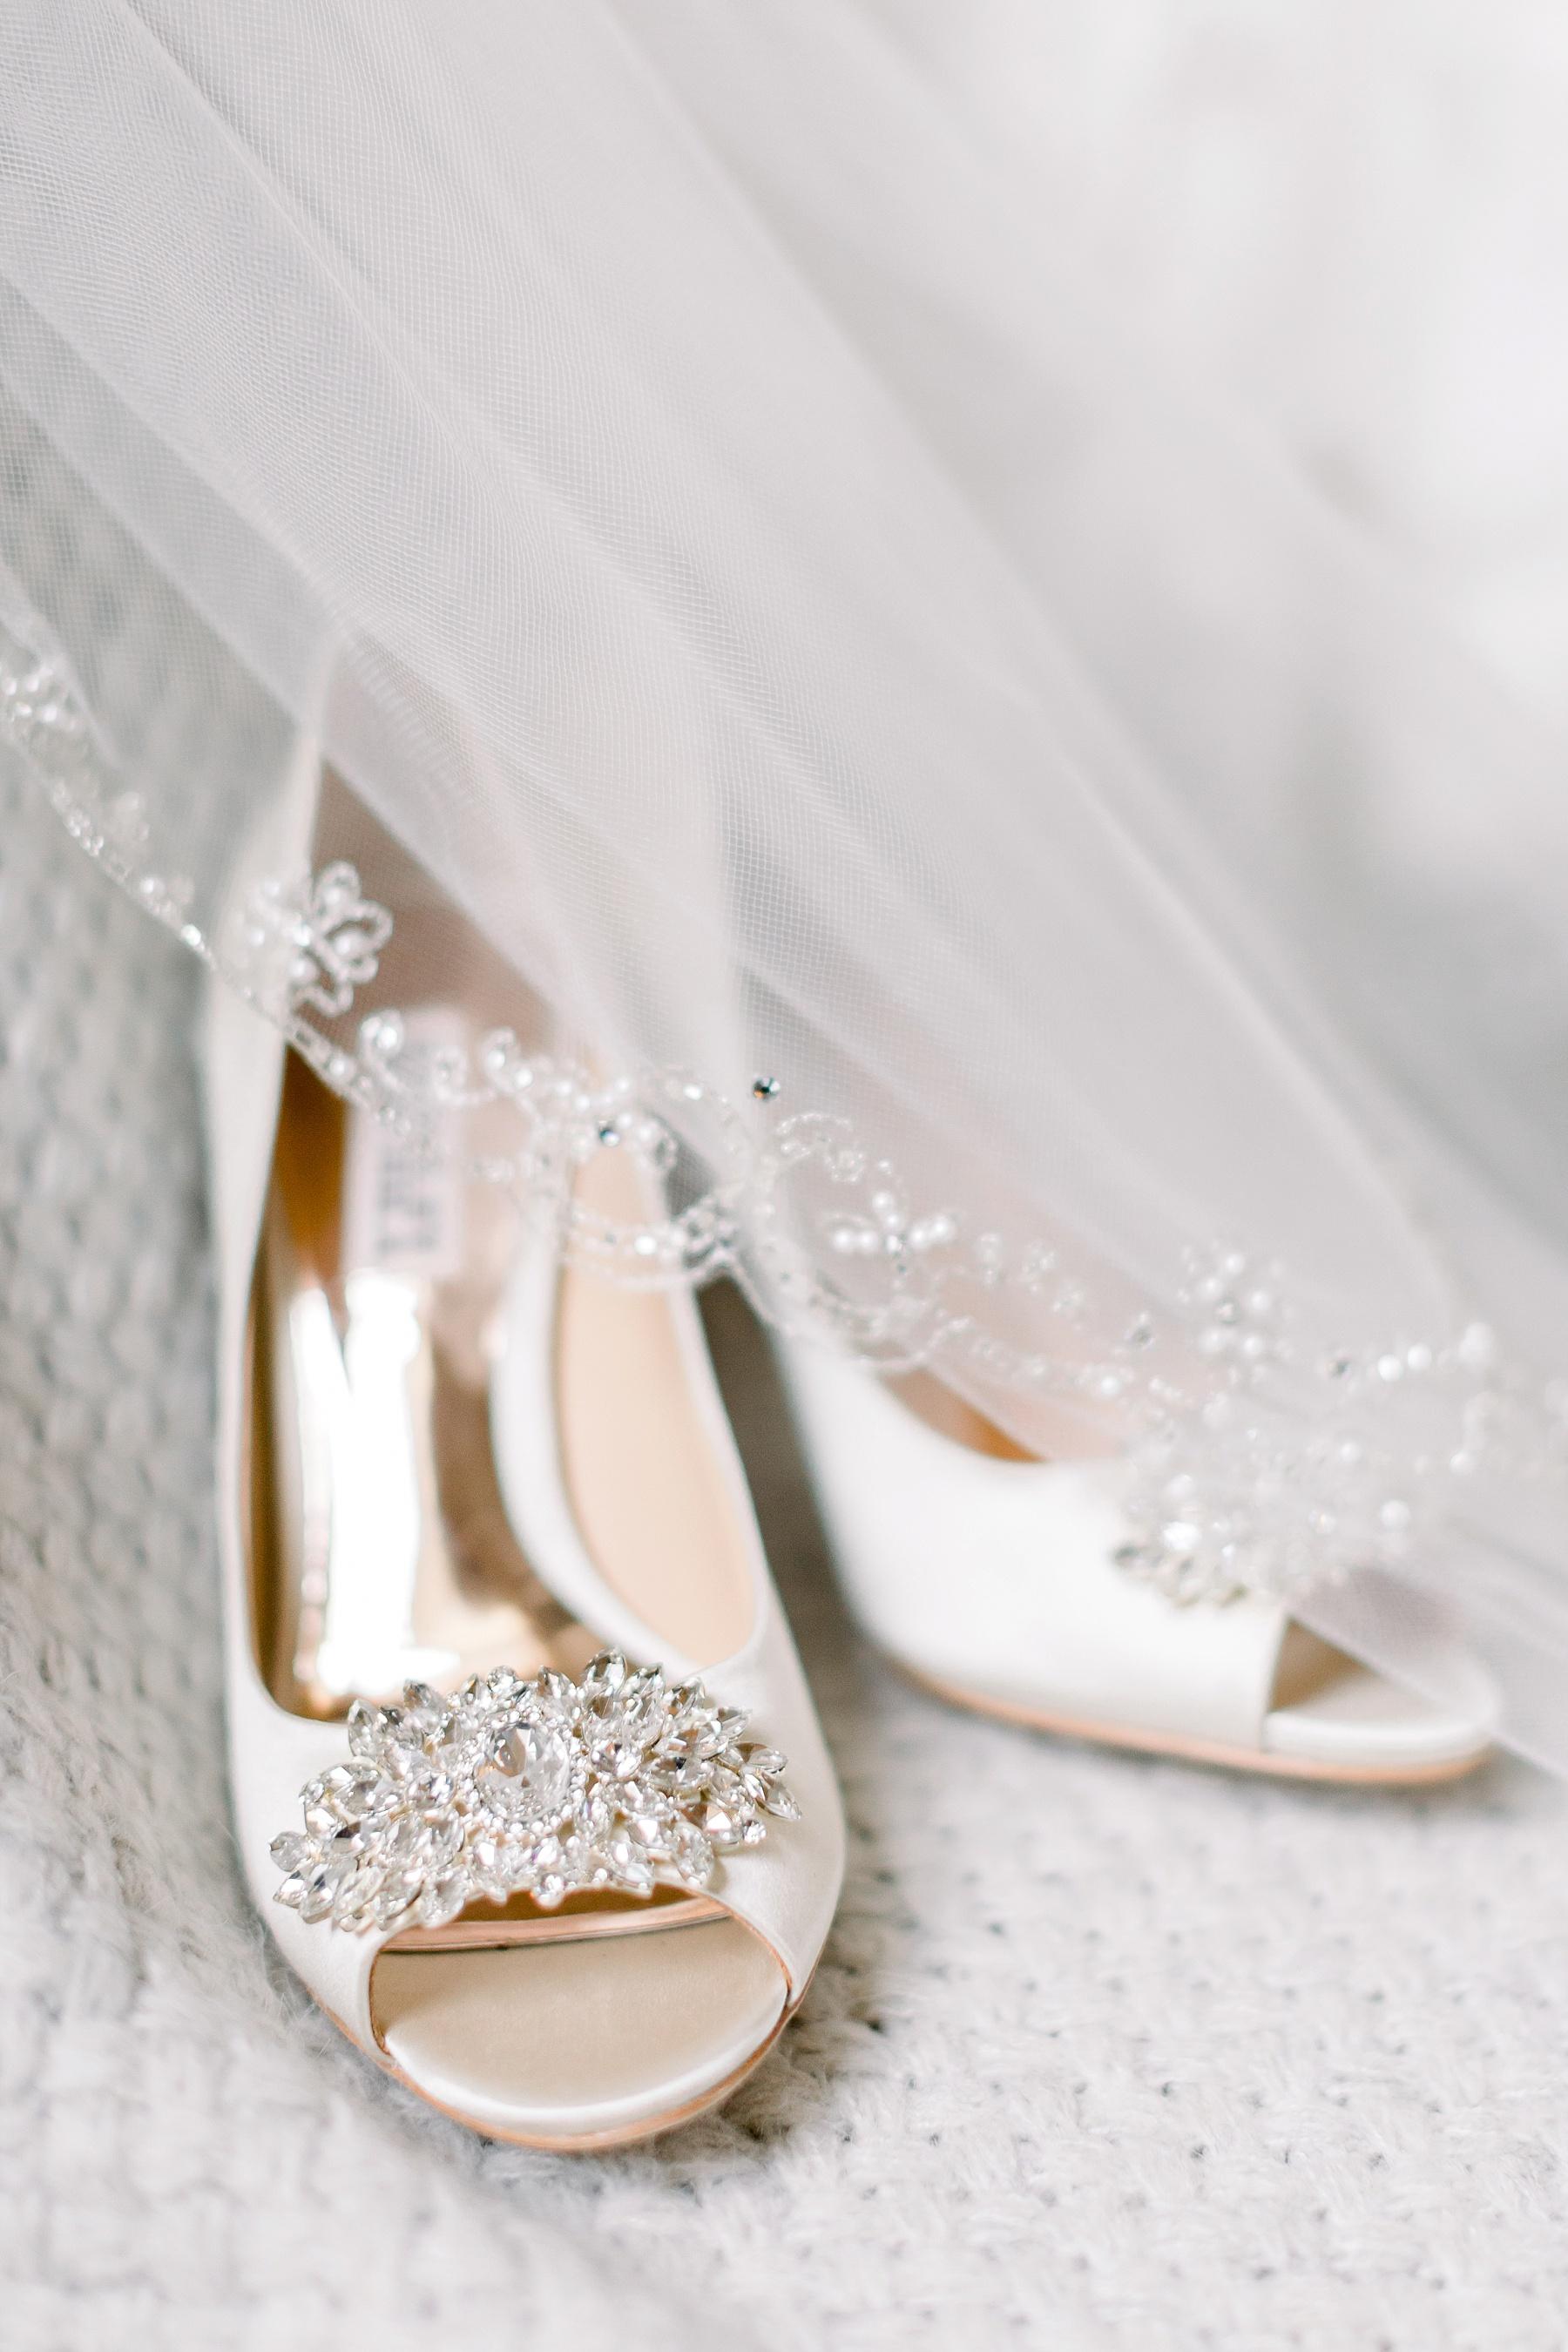 midwest-adventurous-wedding-photographer-elizabeth-ladean-photography-photo_4685.jpg